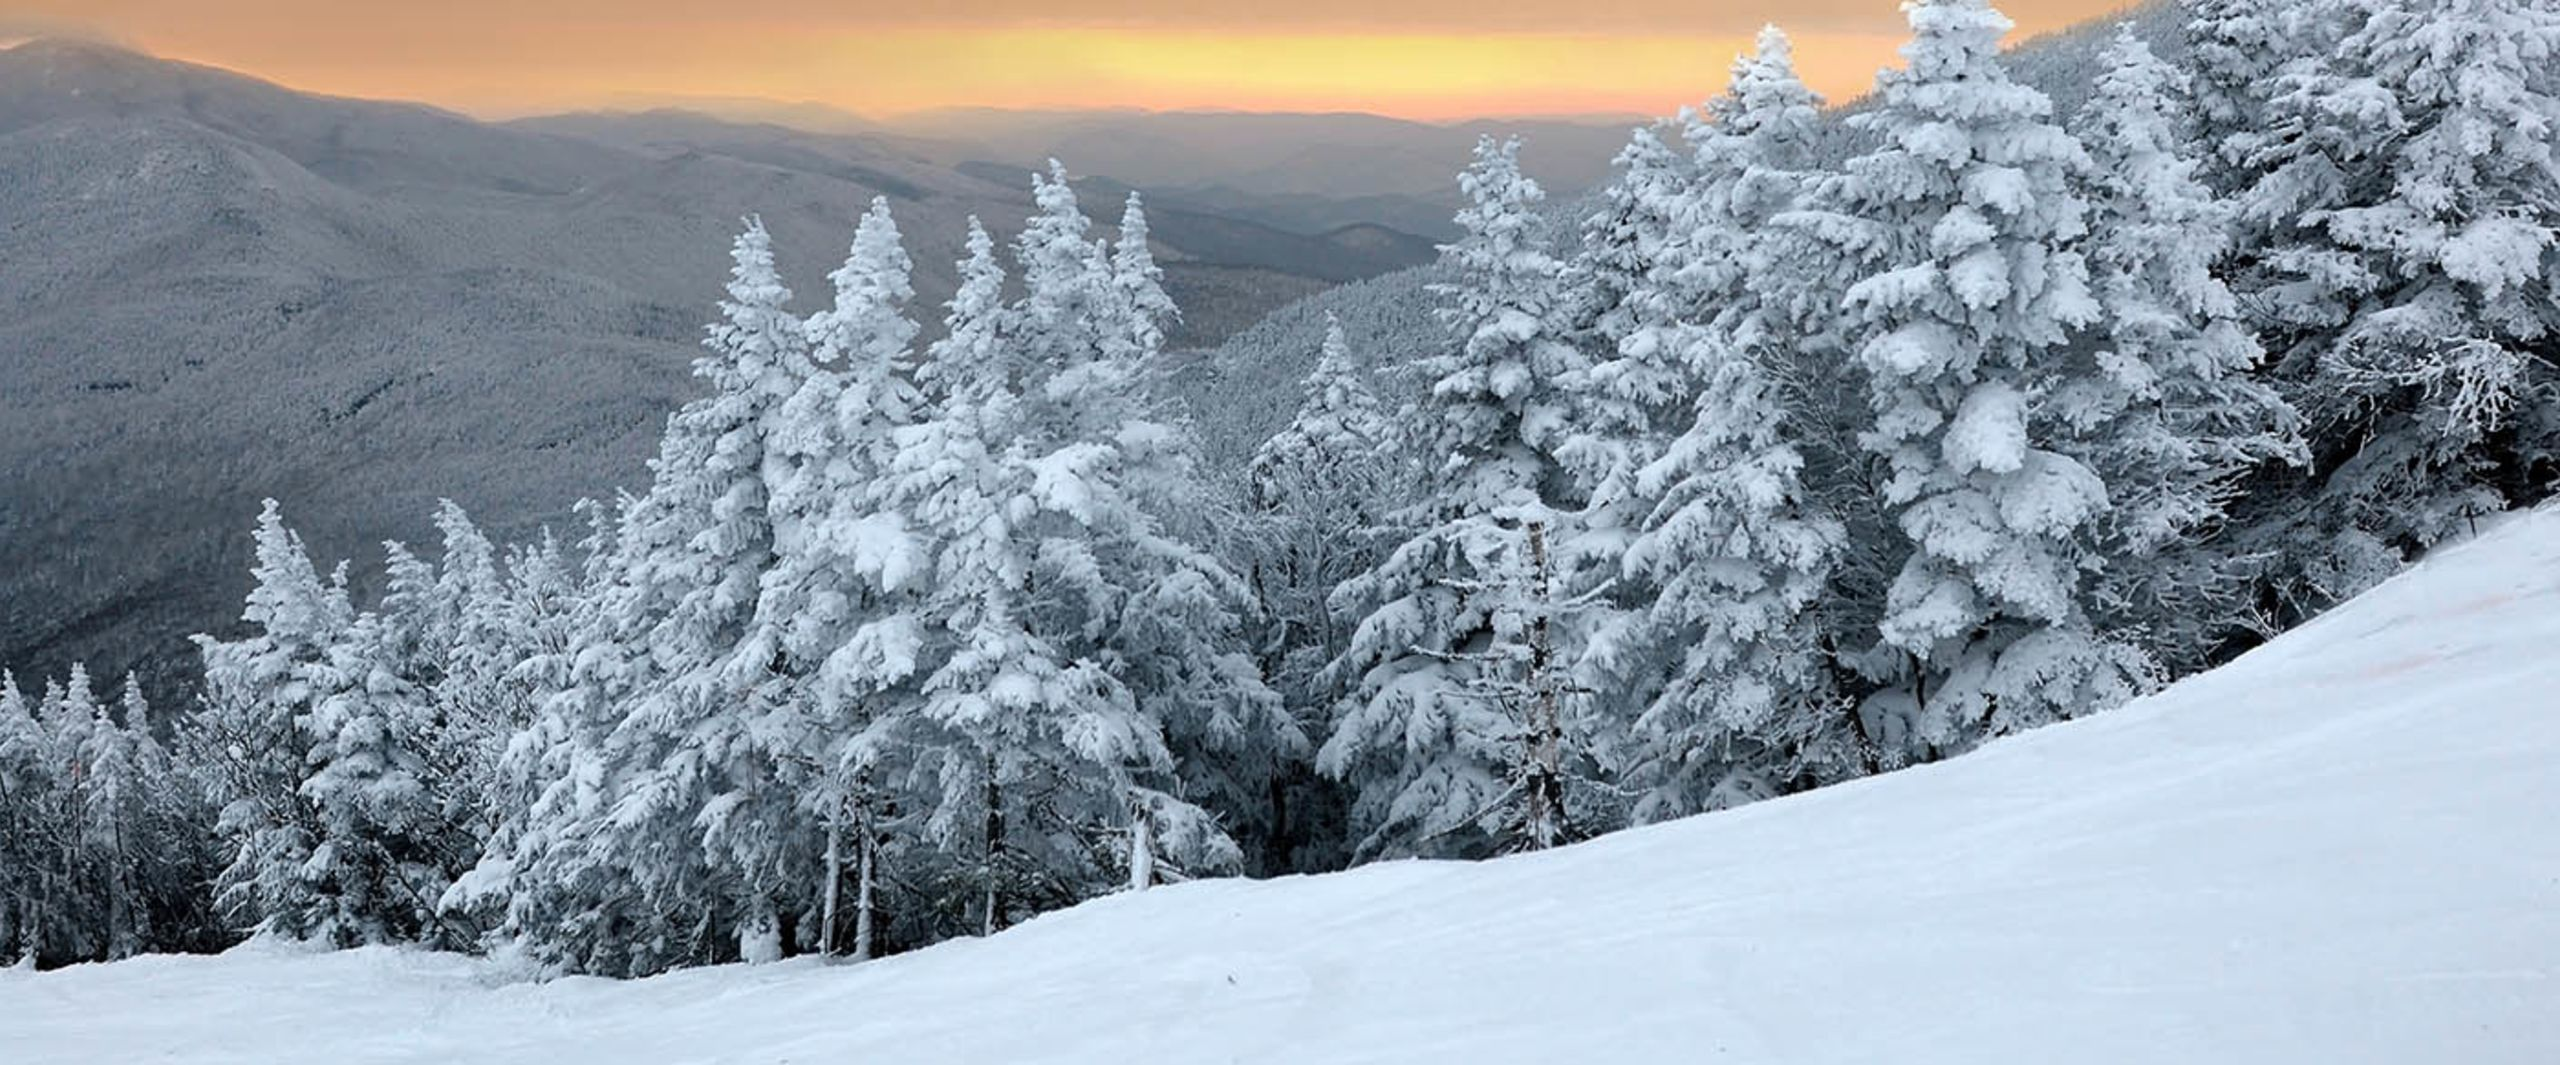 Peaceful Winter Views